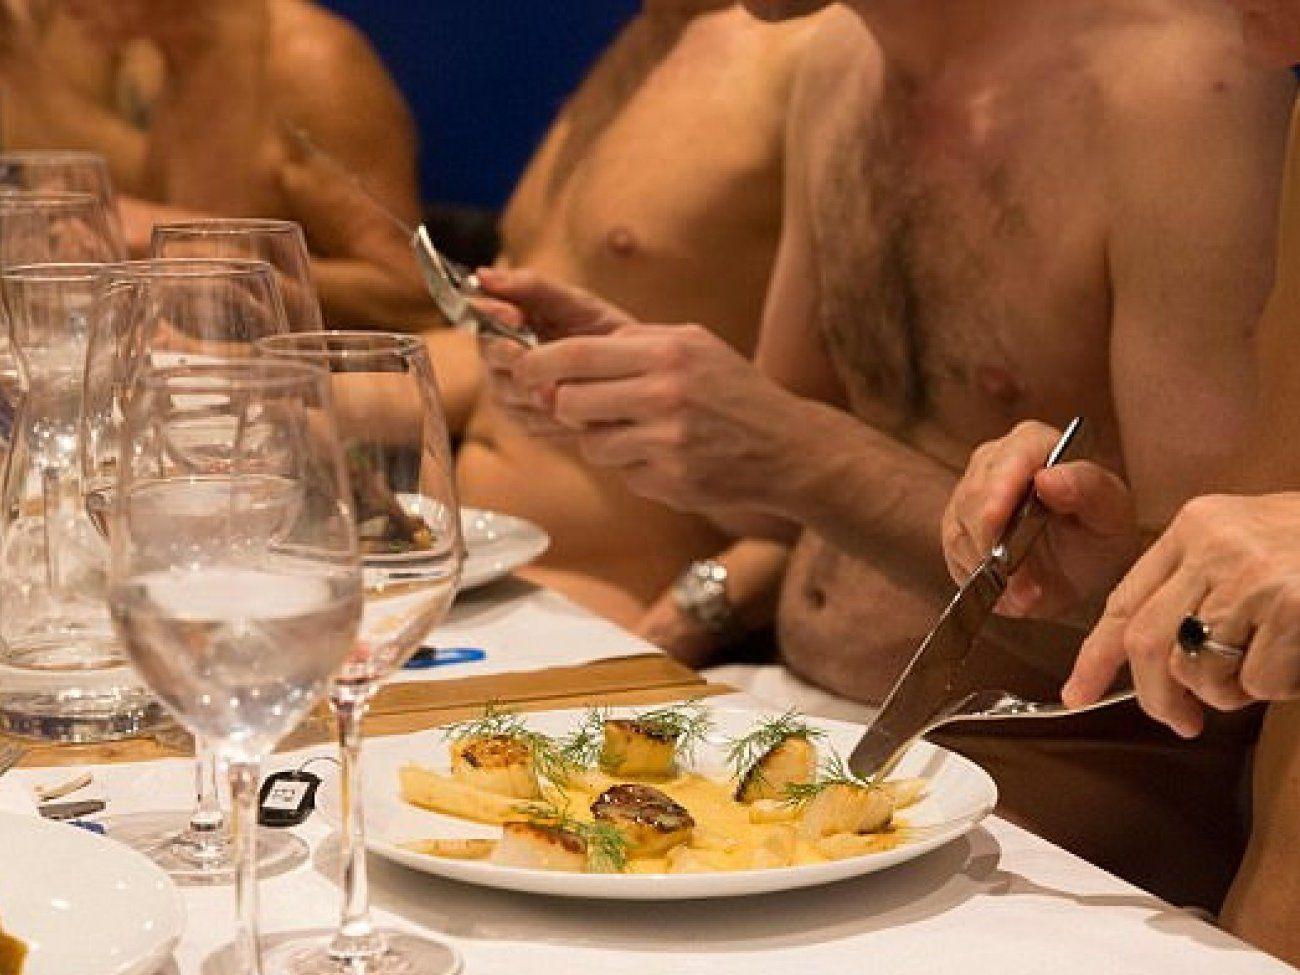 Sexy Nude Supermodels Hot Bikini Melissa Debling Topless Braless